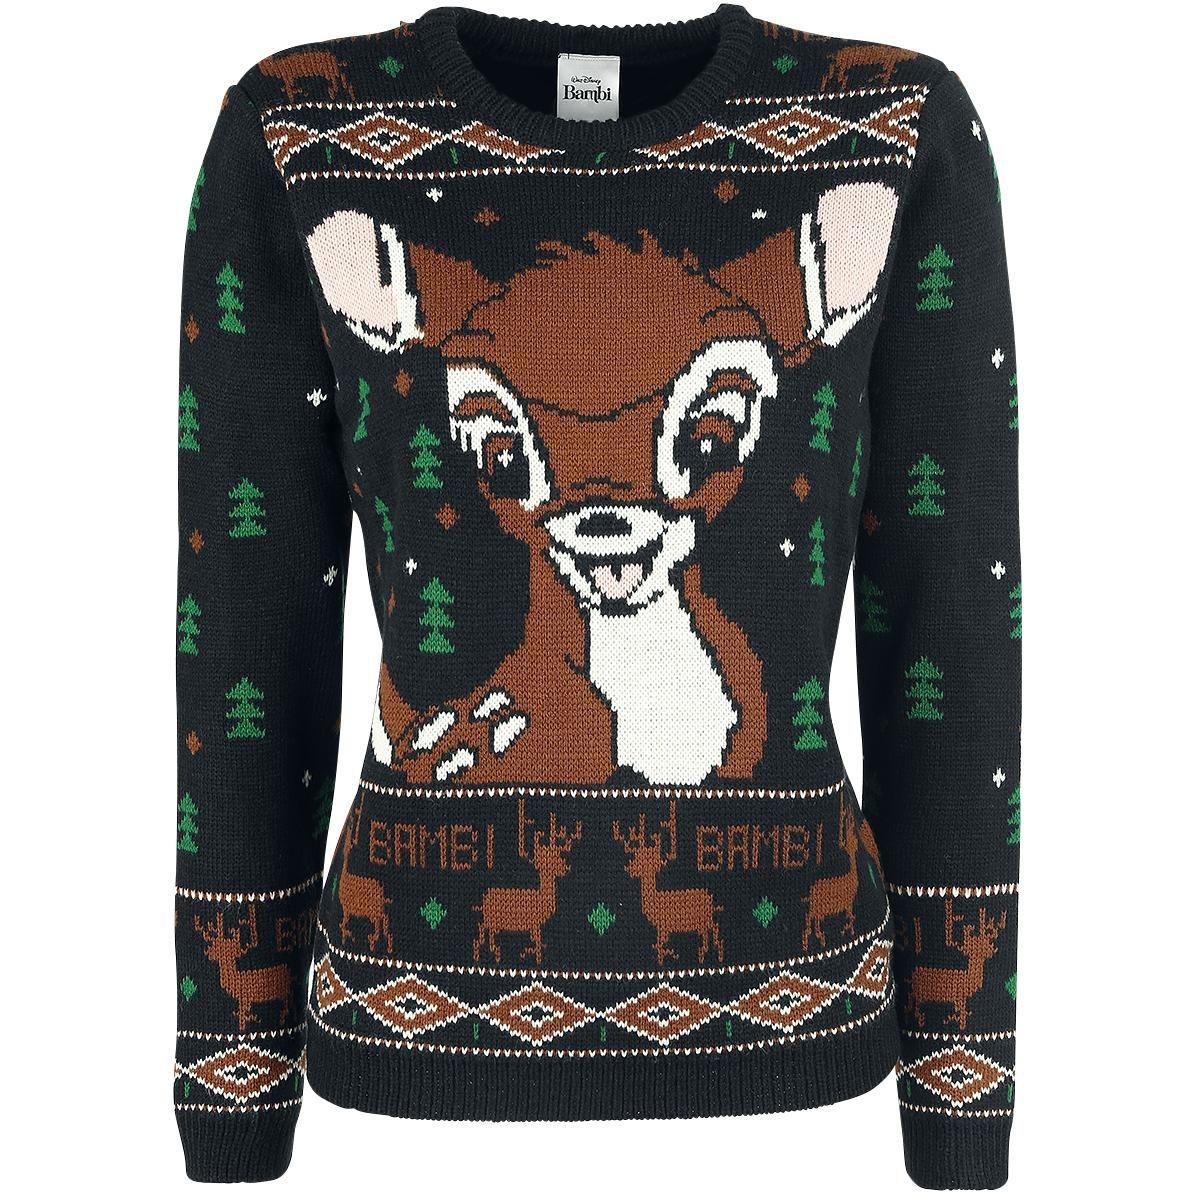 Gebreide Trui Kopen.Bambi Gebreide Trui Vrouw Forest Knit Jumper Multicolour